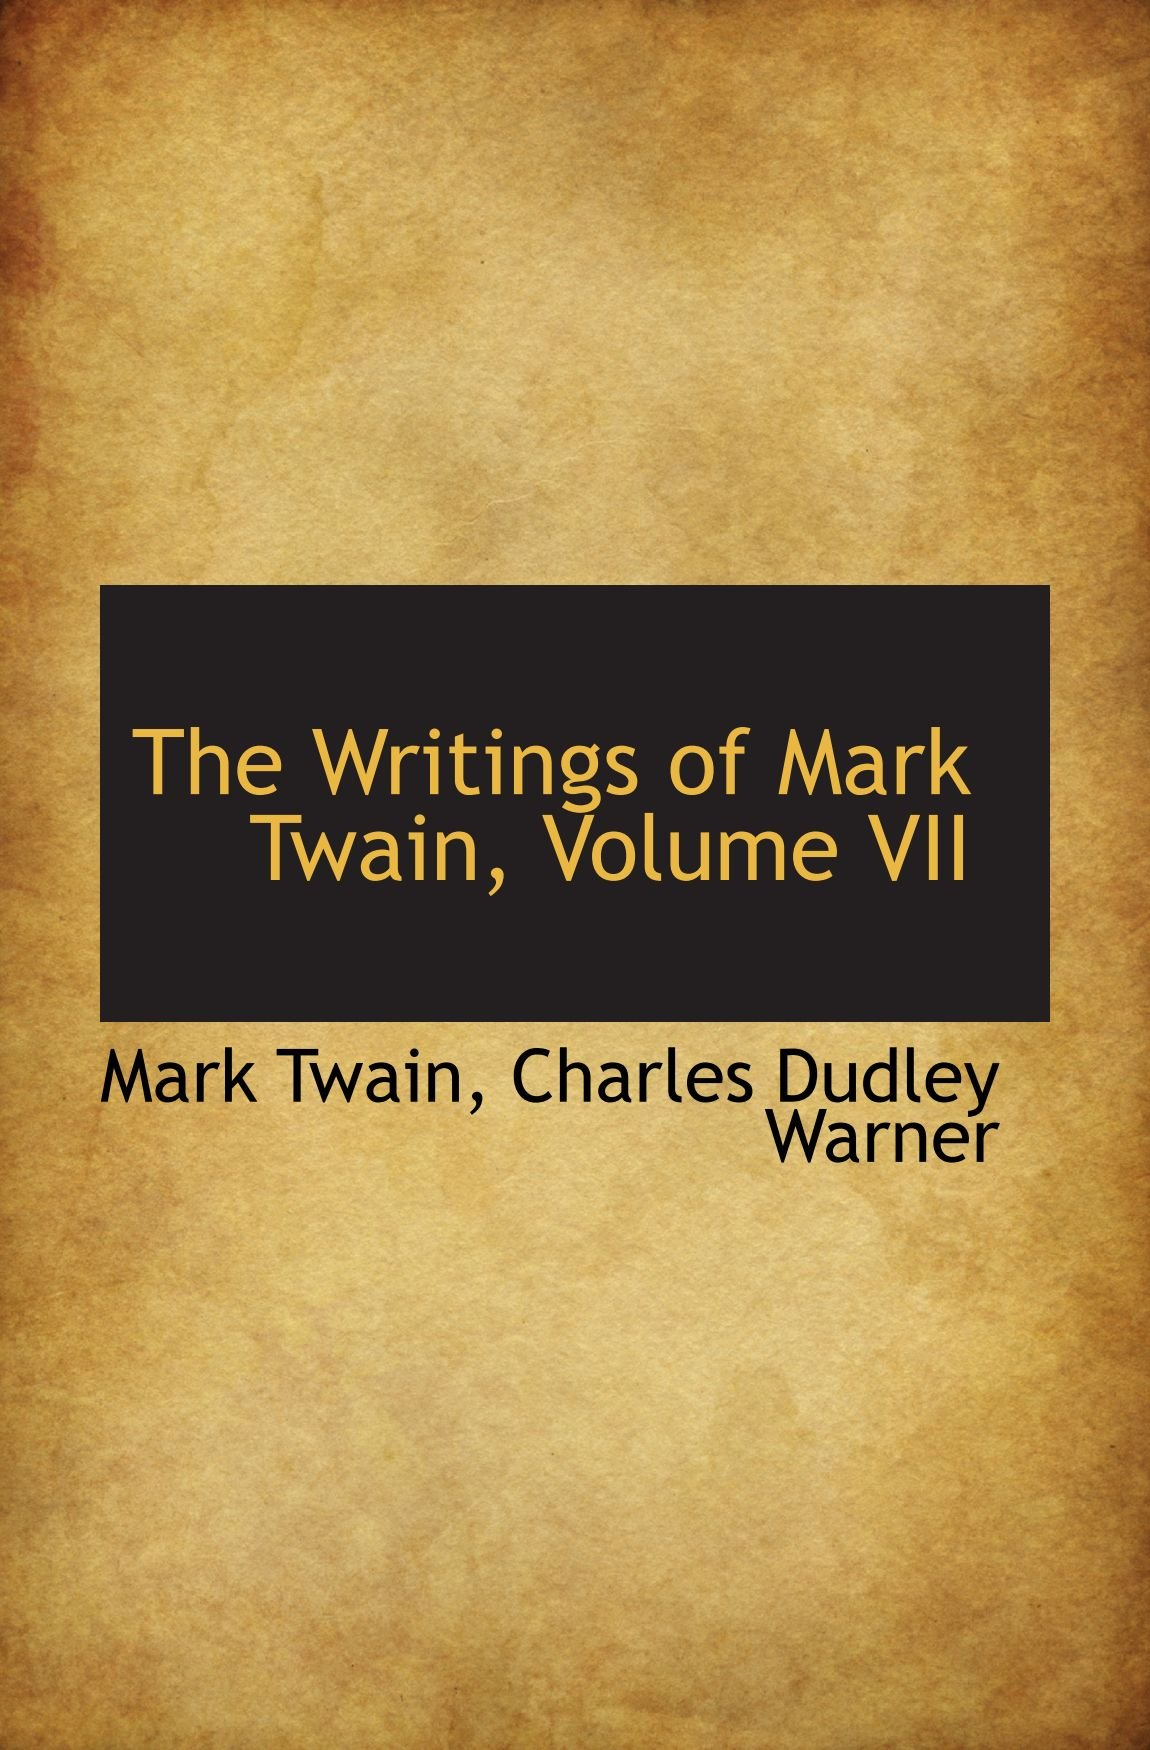 The Writings of Mark Twain, Volume VII PDF